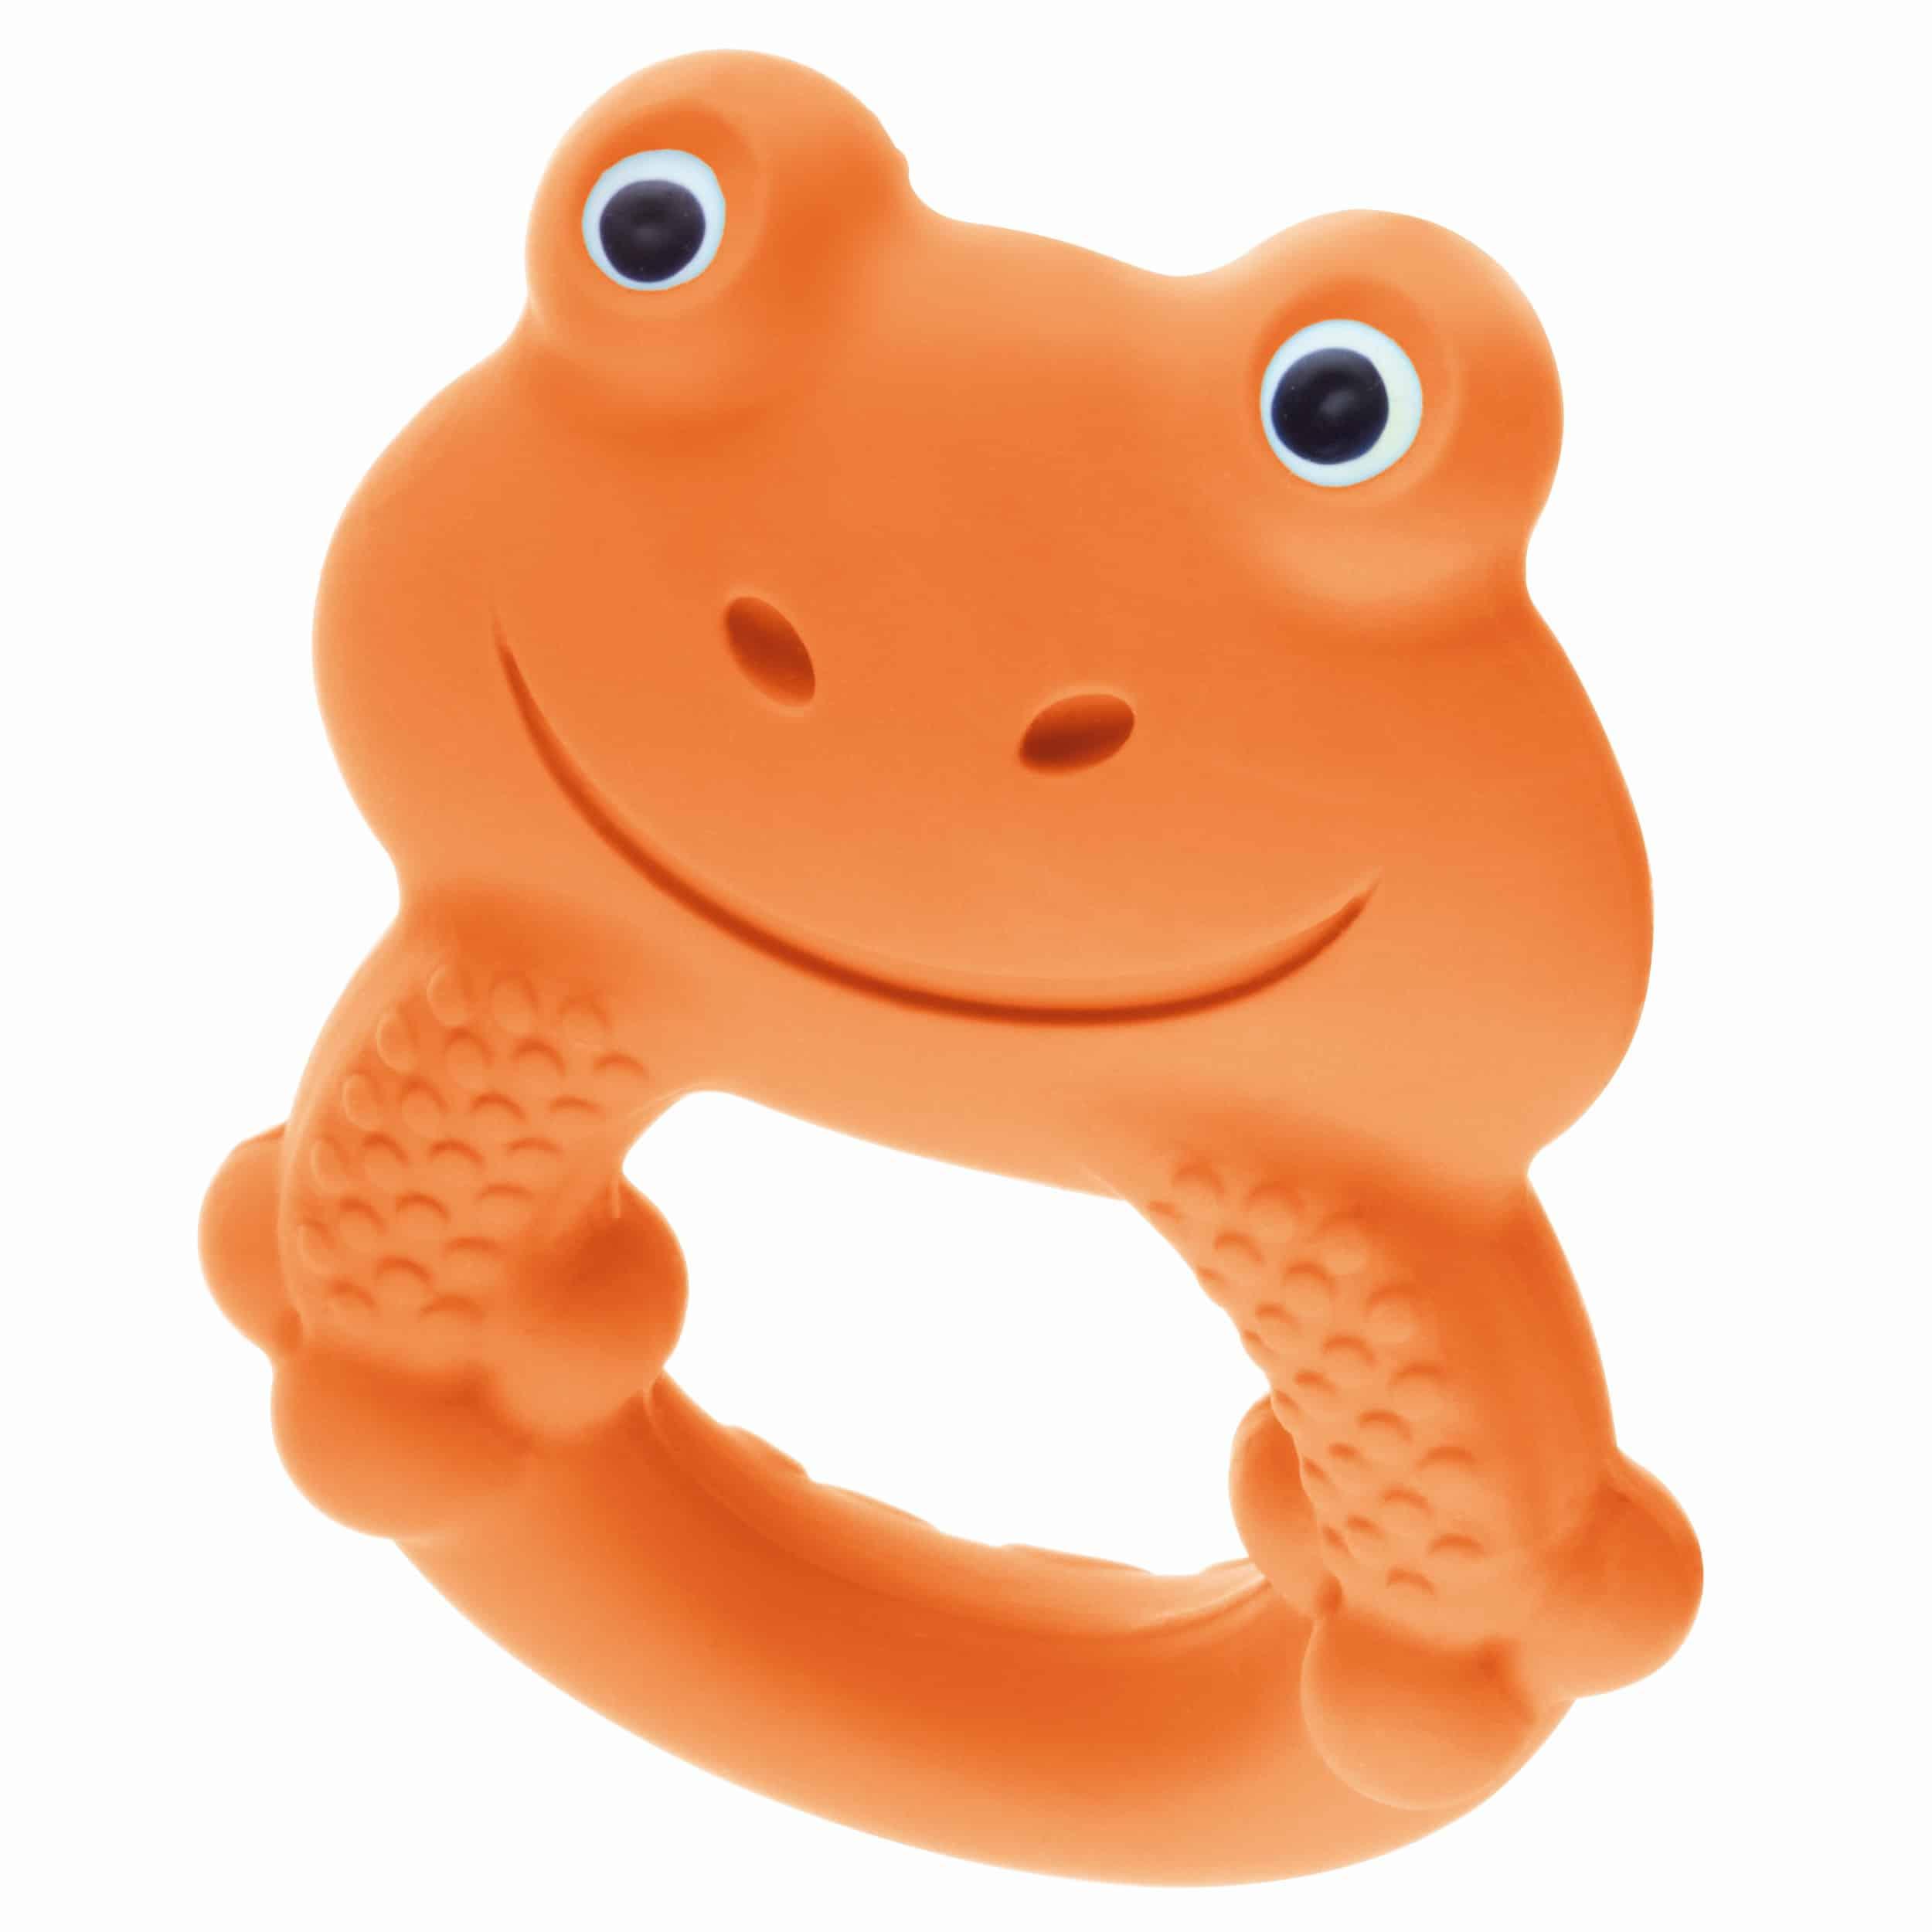 MAM נשכן מקס הצפרדע צבע כתום מחיר 50 שח צילום יחצ חול